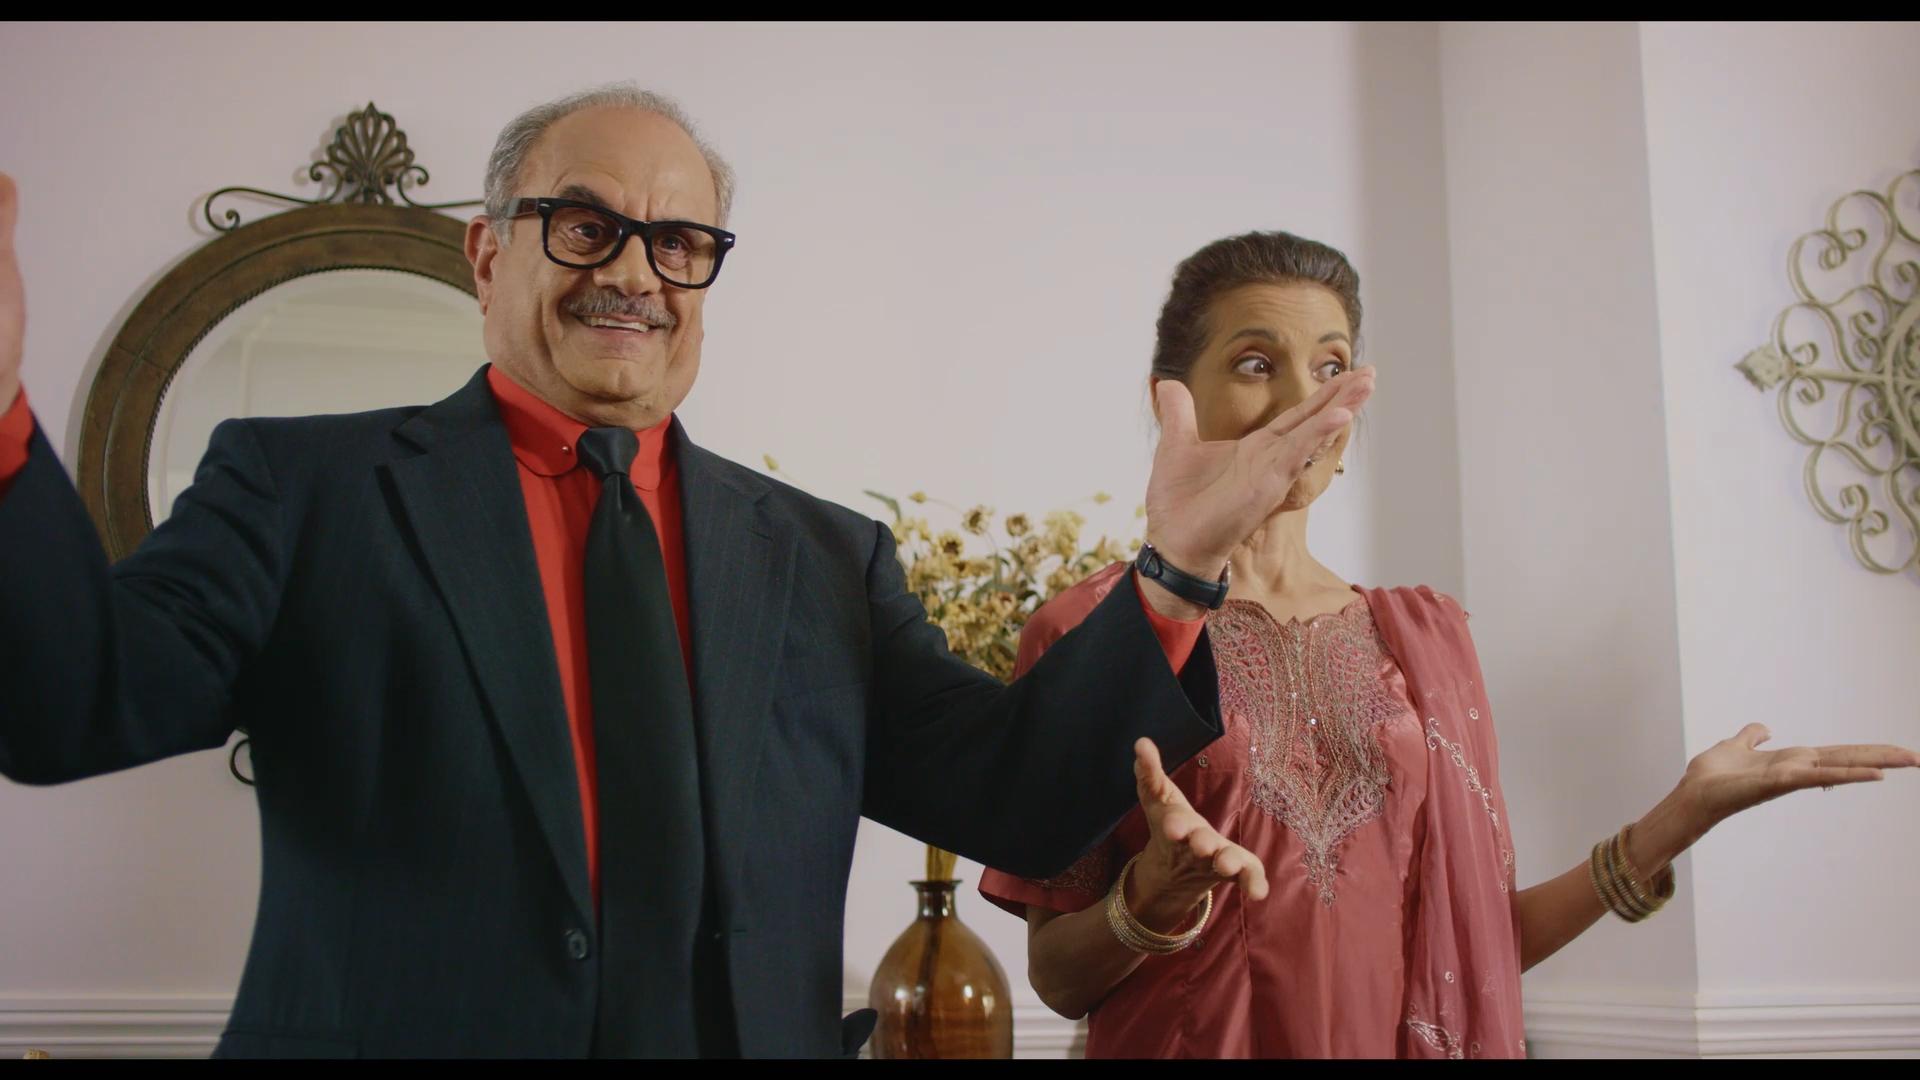 Veena Bidasha and Marshall Manesh in The Last Conception (2020)